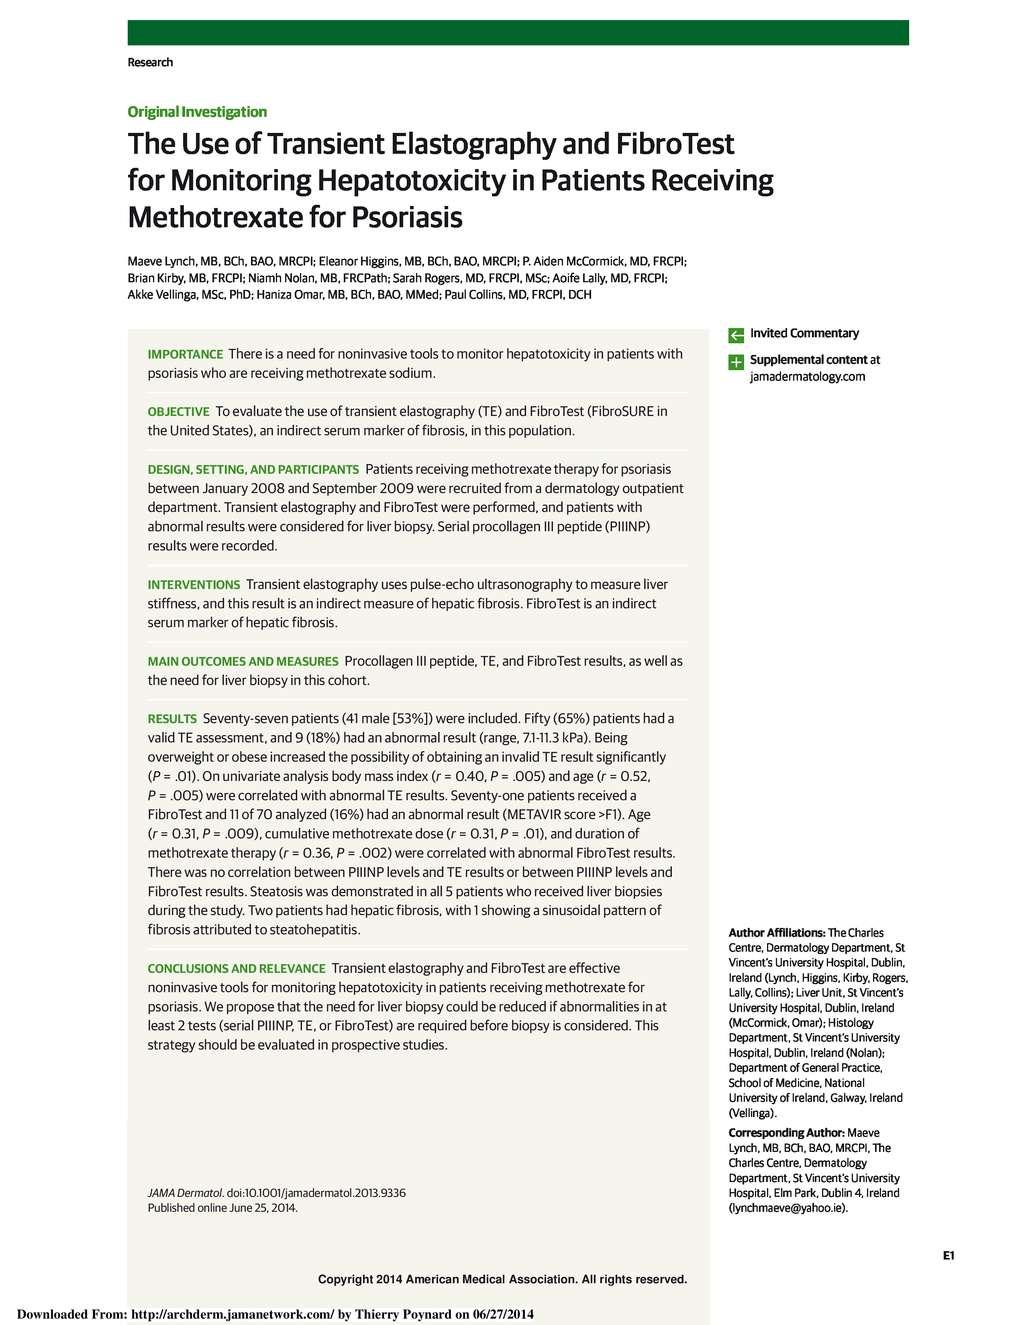 BioPredictive Library - FibroTest Publications